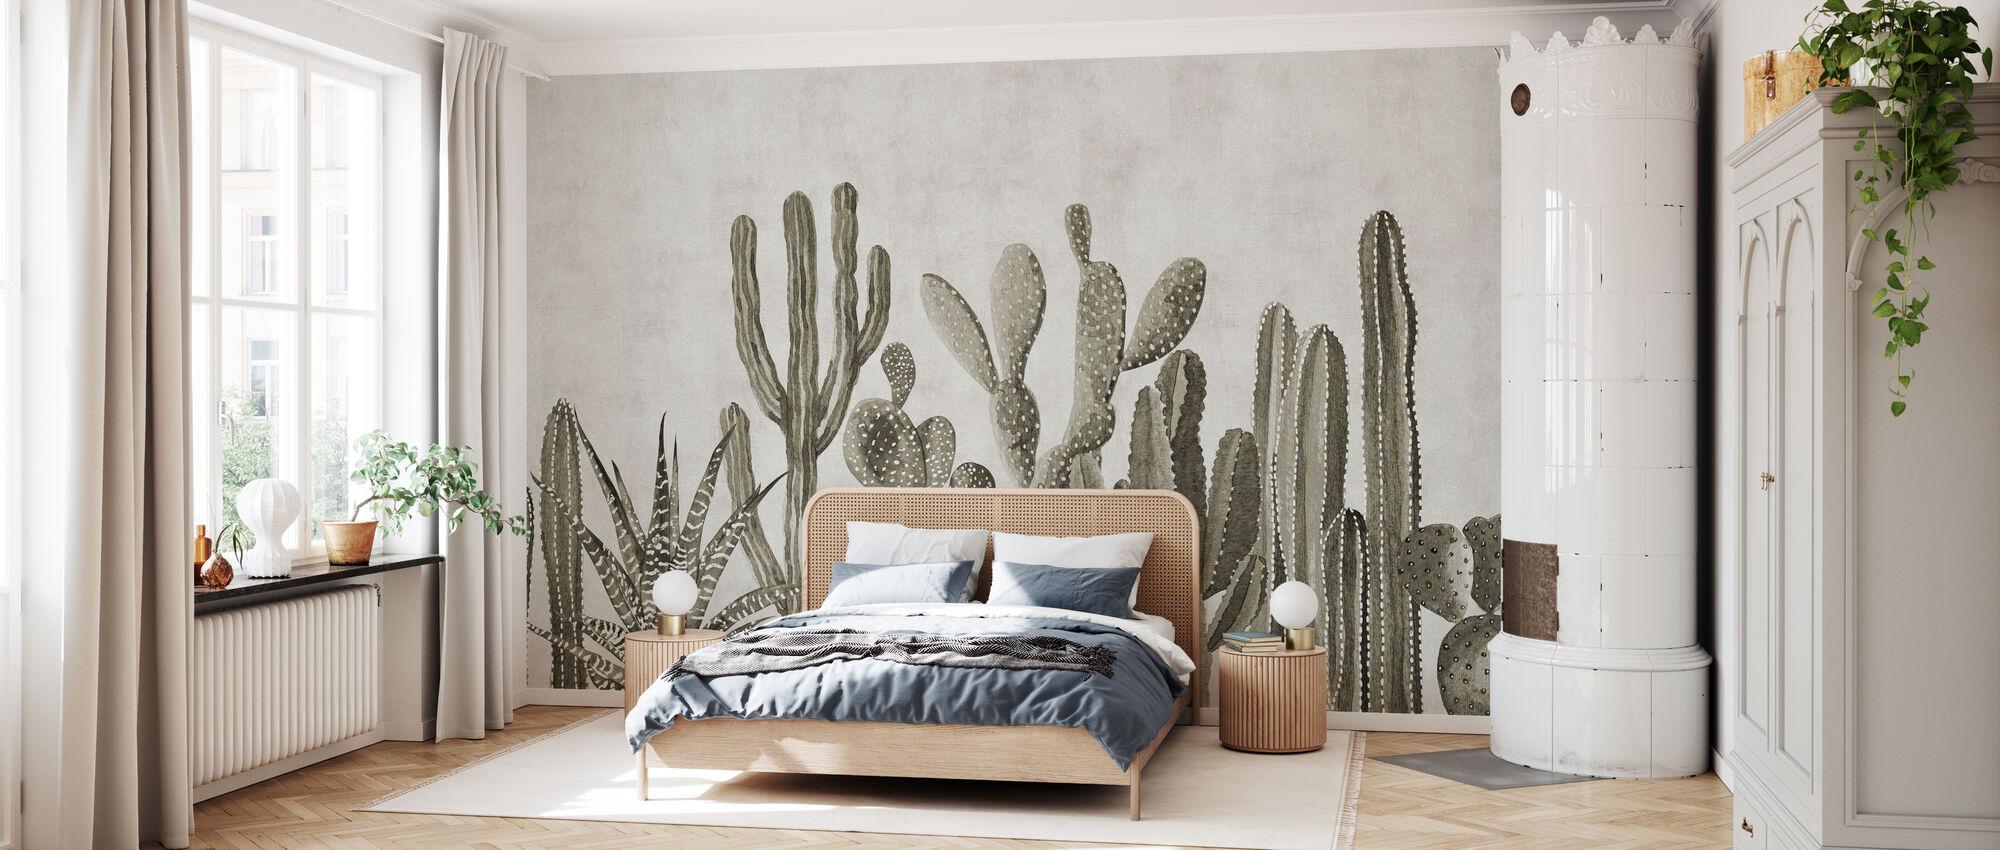 Atacama Cactus - Sepia - Wallpaper - Bedroom